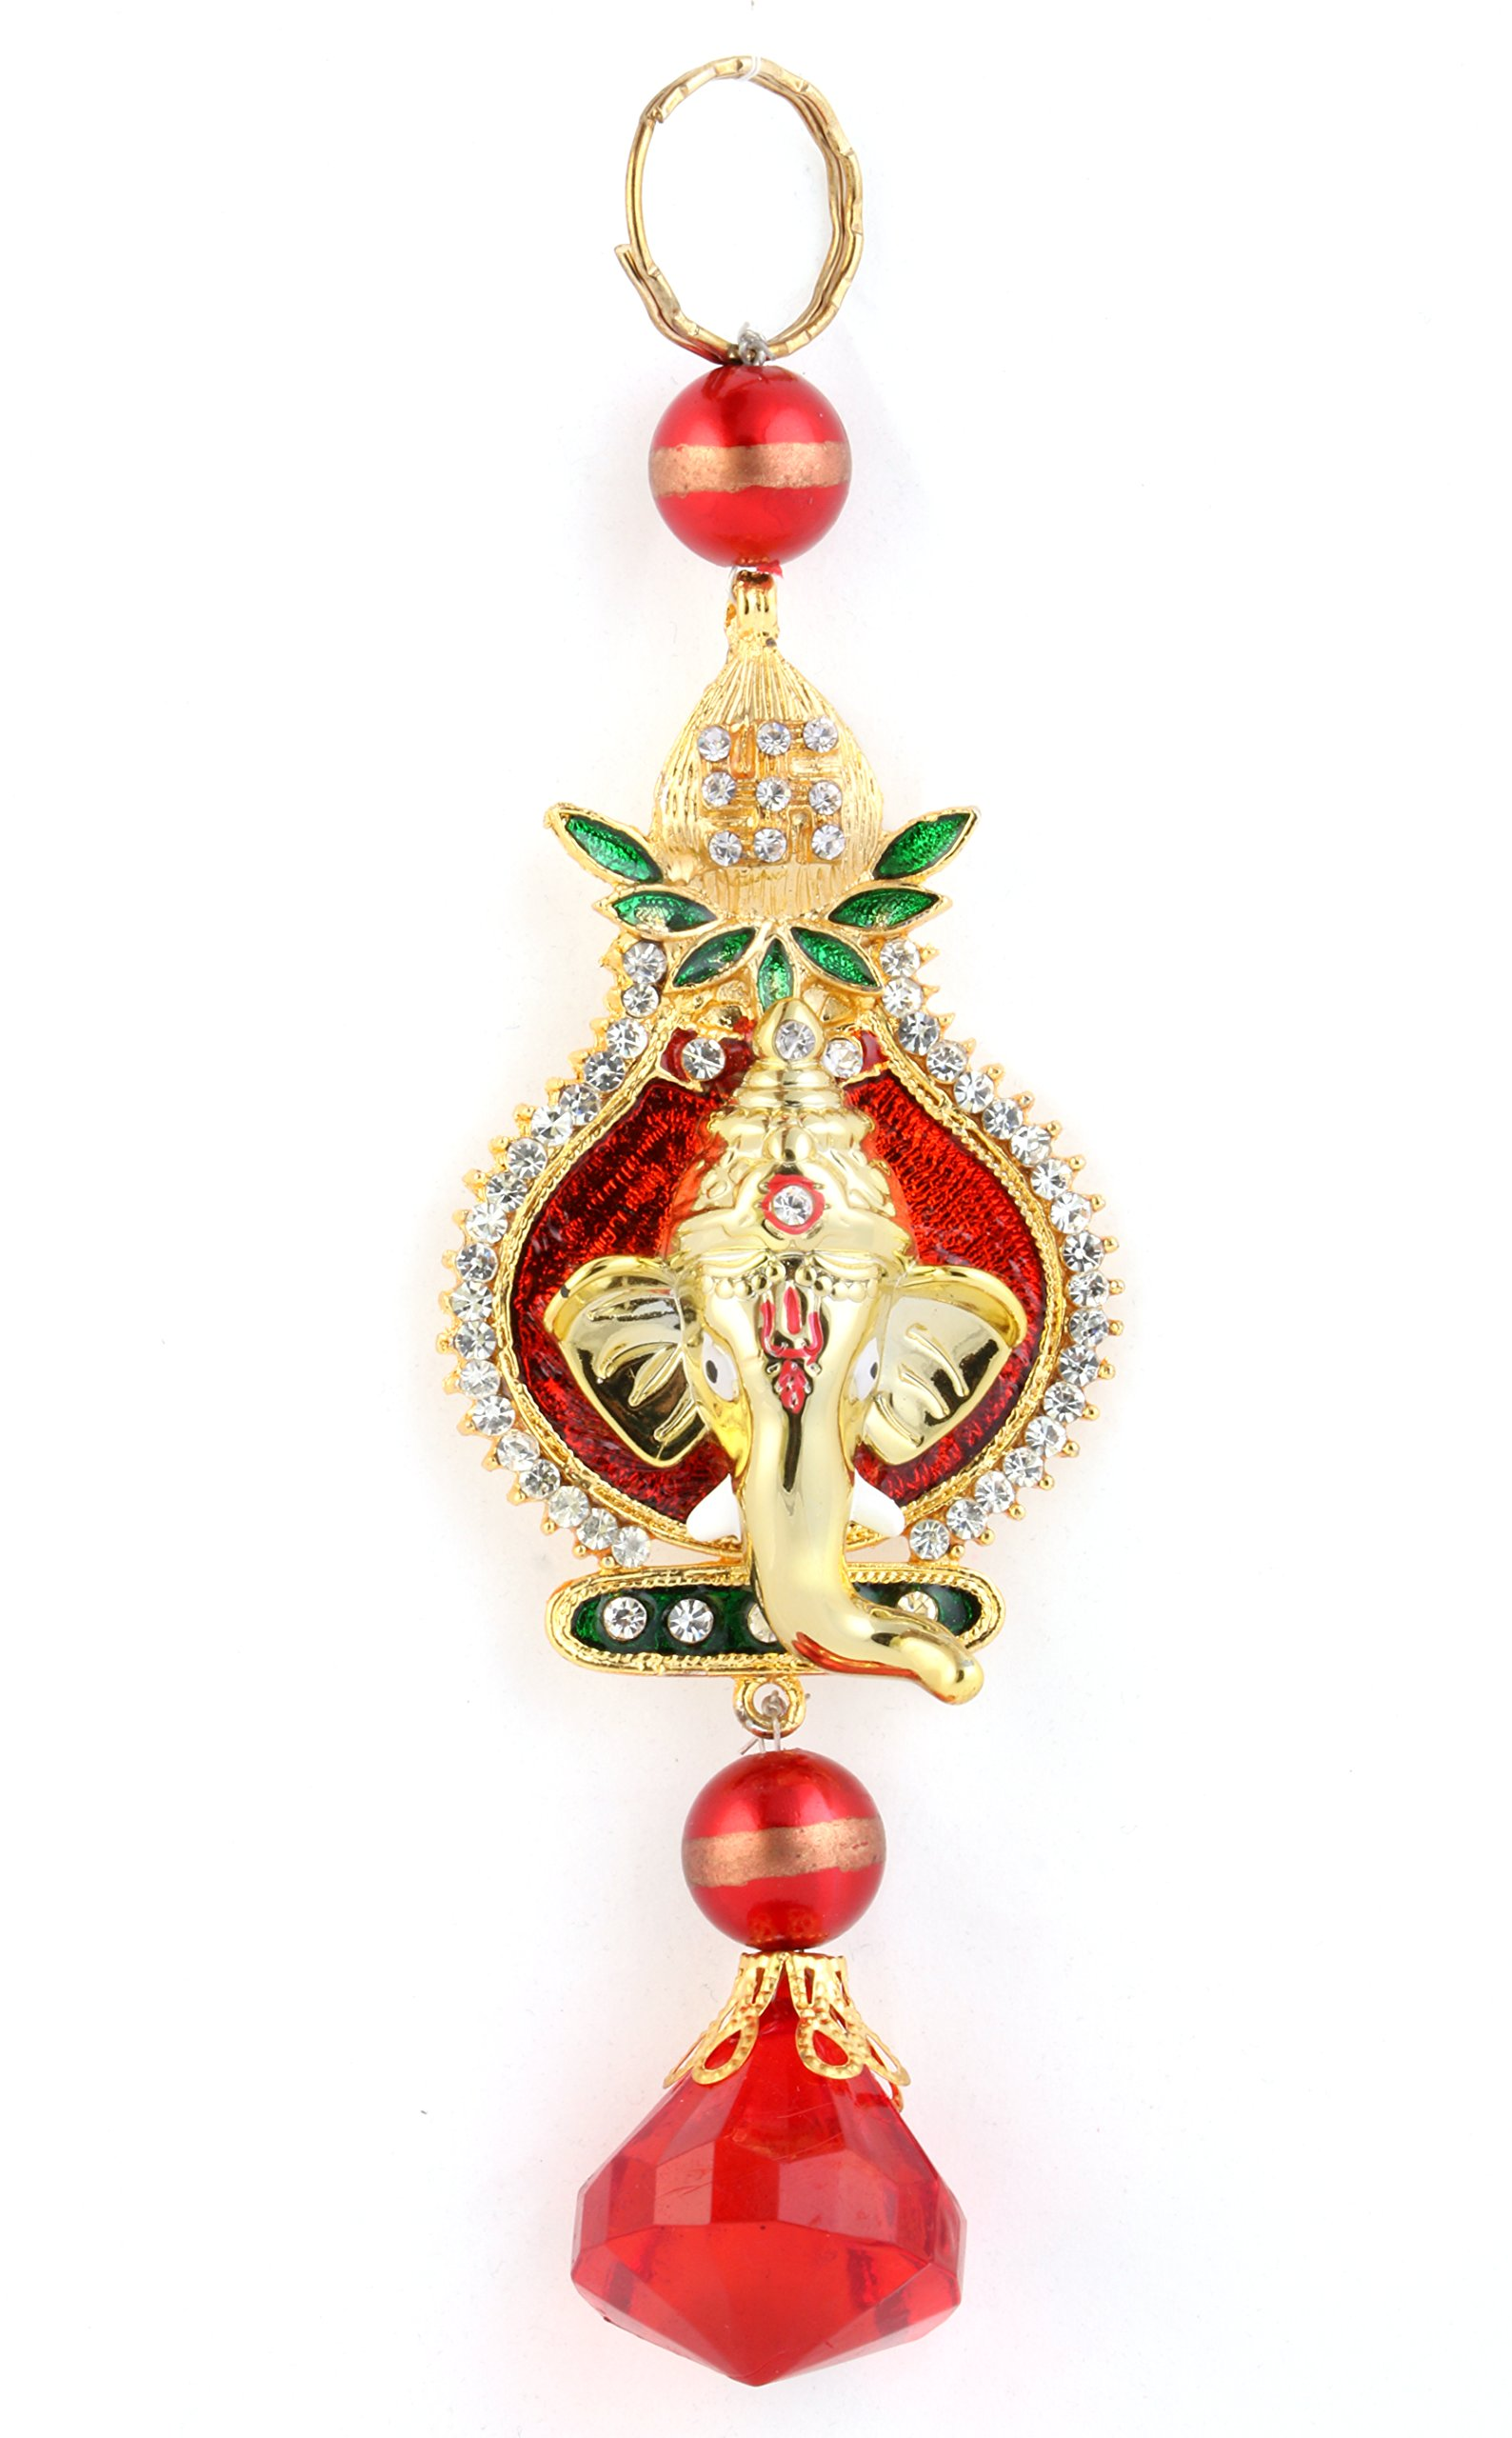 Ganesha Car Hanging on Kalash Ganesha hanging Wall Decor Sculpture Indian Decor for Wall Decoration for Diwali/Ganesh Chaturthi/Wedding return gift/Car mirror hanging (15cm4cm)